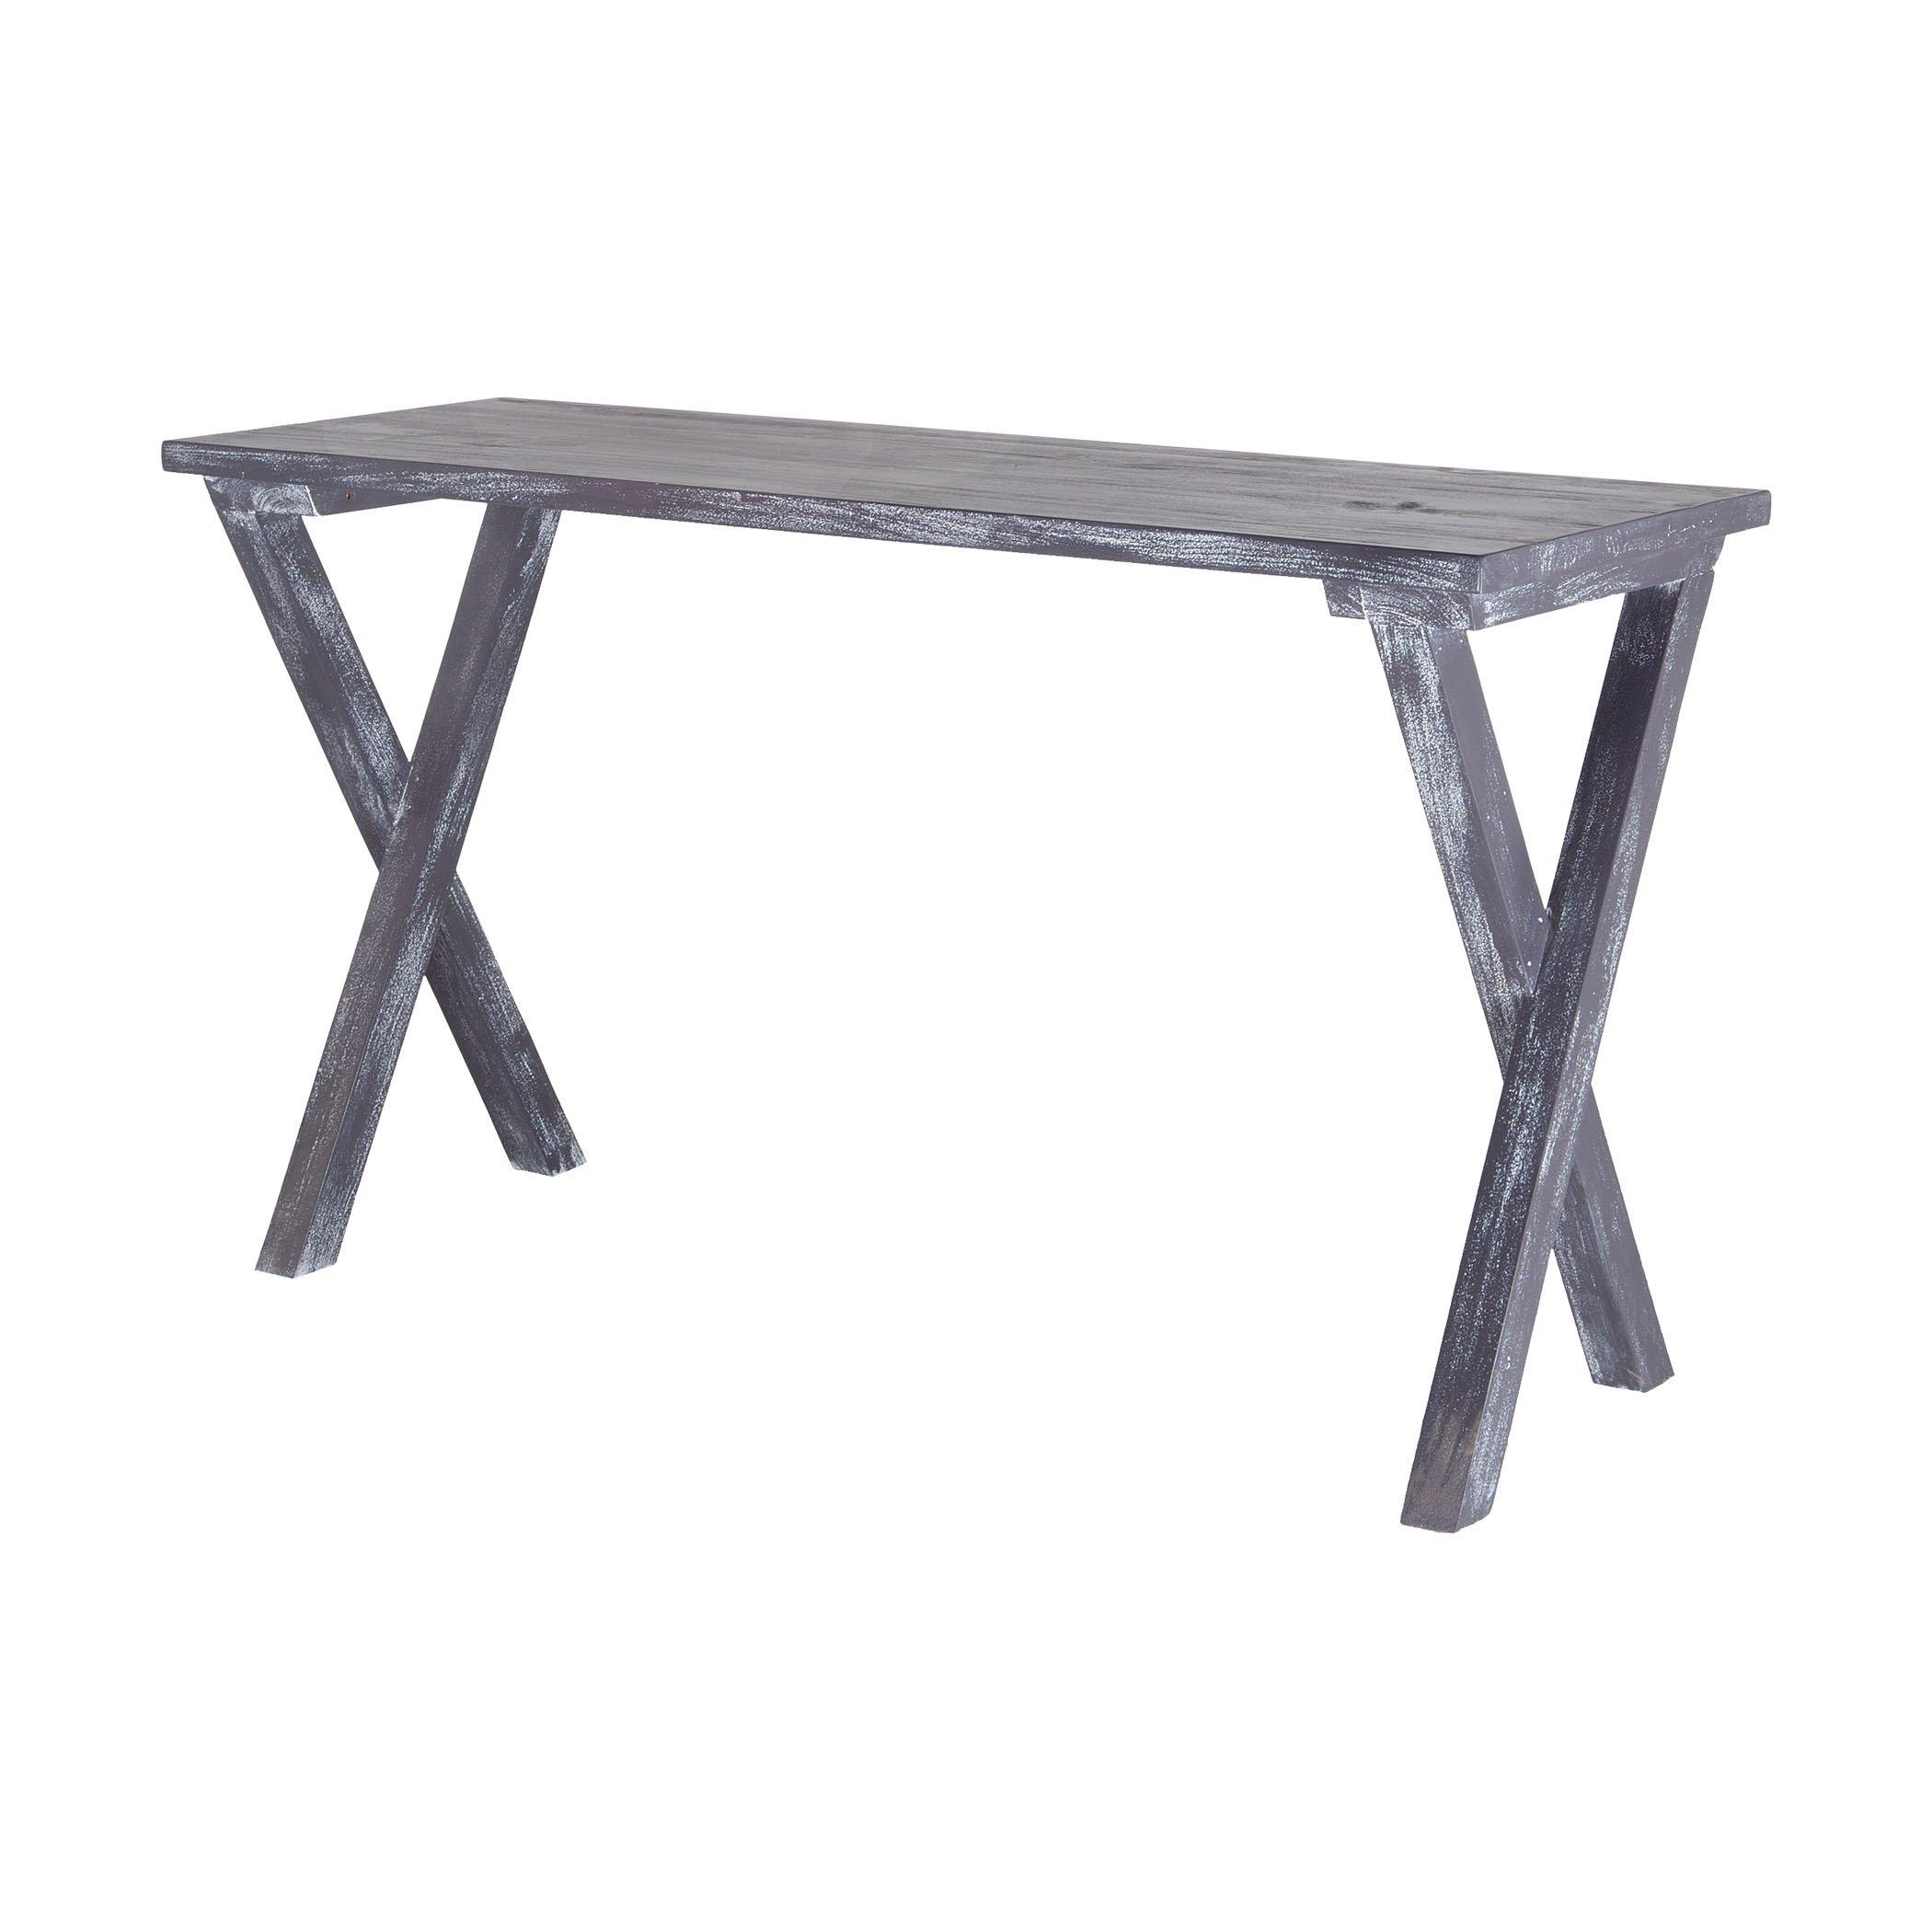 Dimond Home 7011-039 Cross Legged Console Table, 54'' x 18'' x 30''